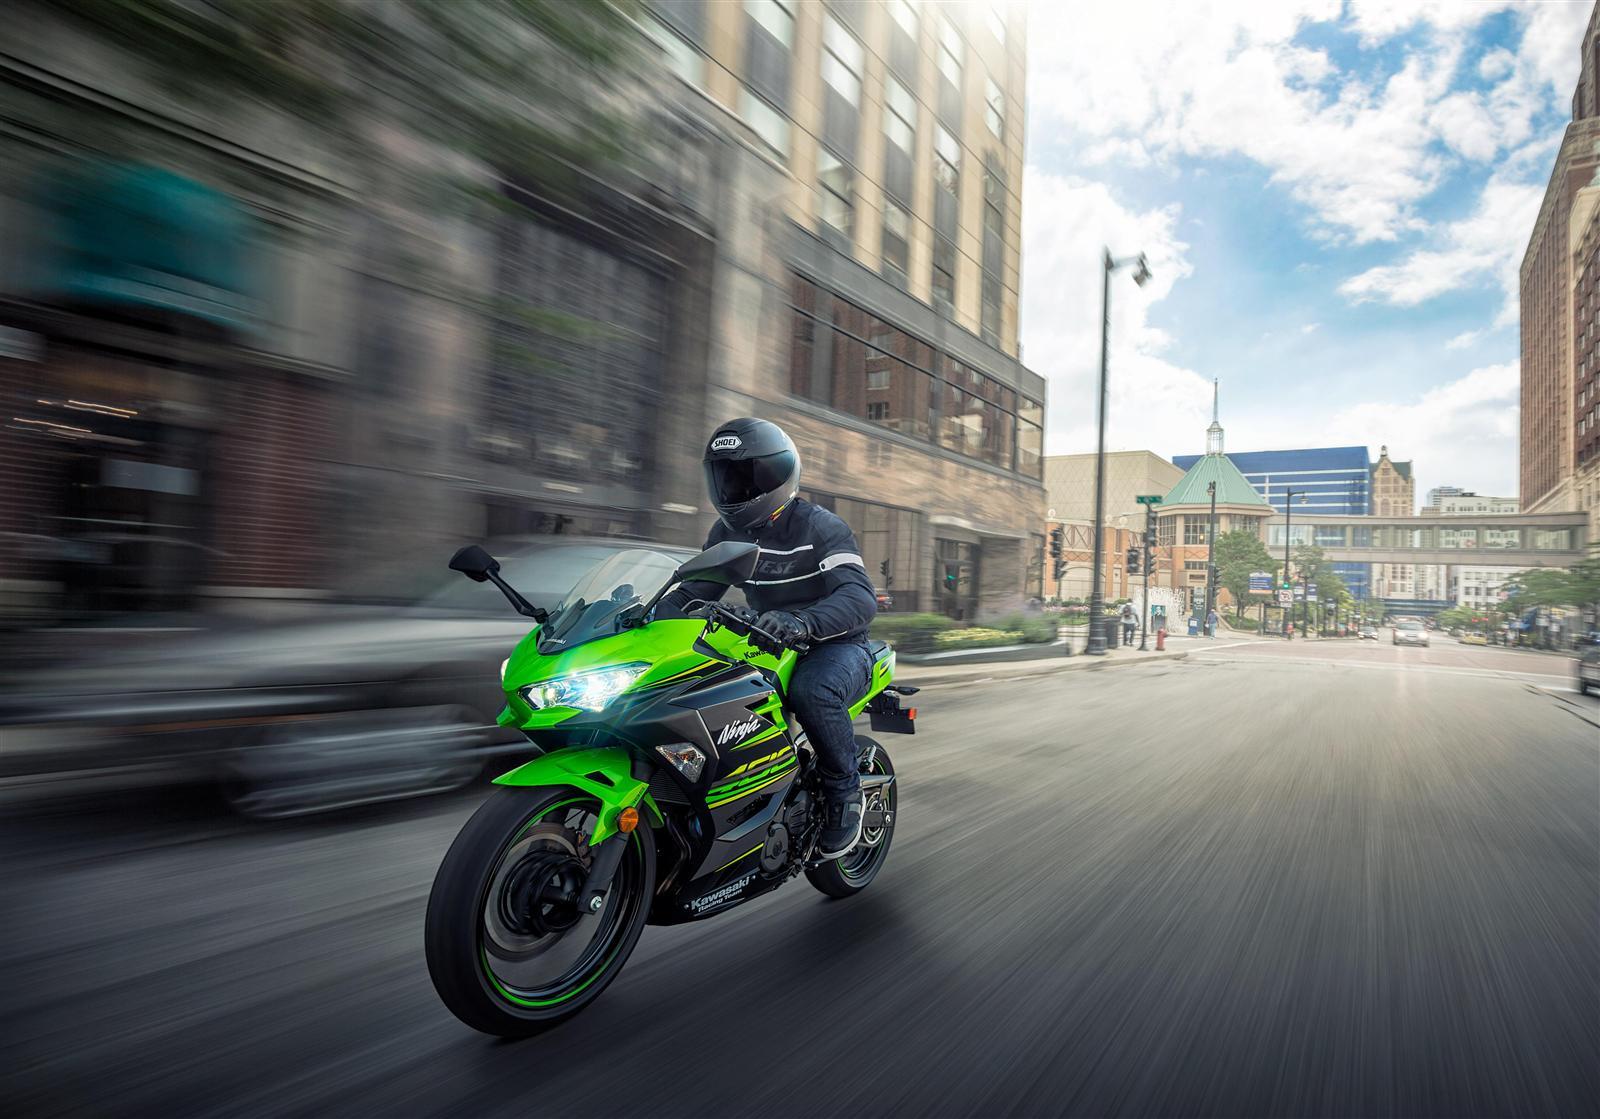 Kawasaki Ninja 400 w mieście